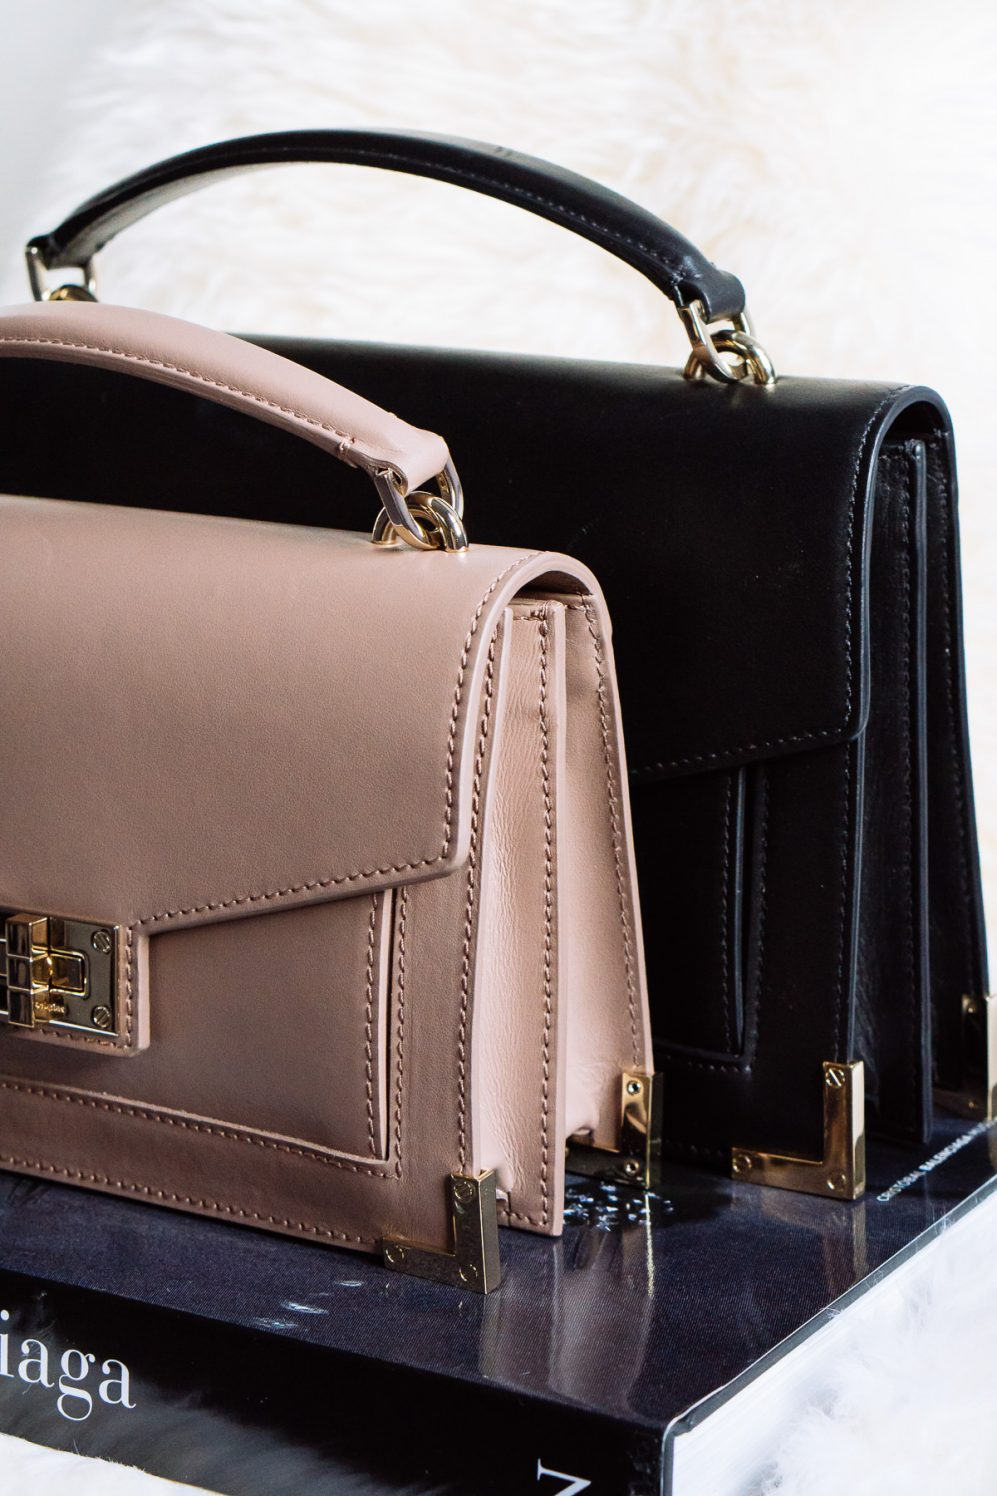 c5dd14ea1566 Introducing  The Emily Bag By The Kooples - PurseBlog